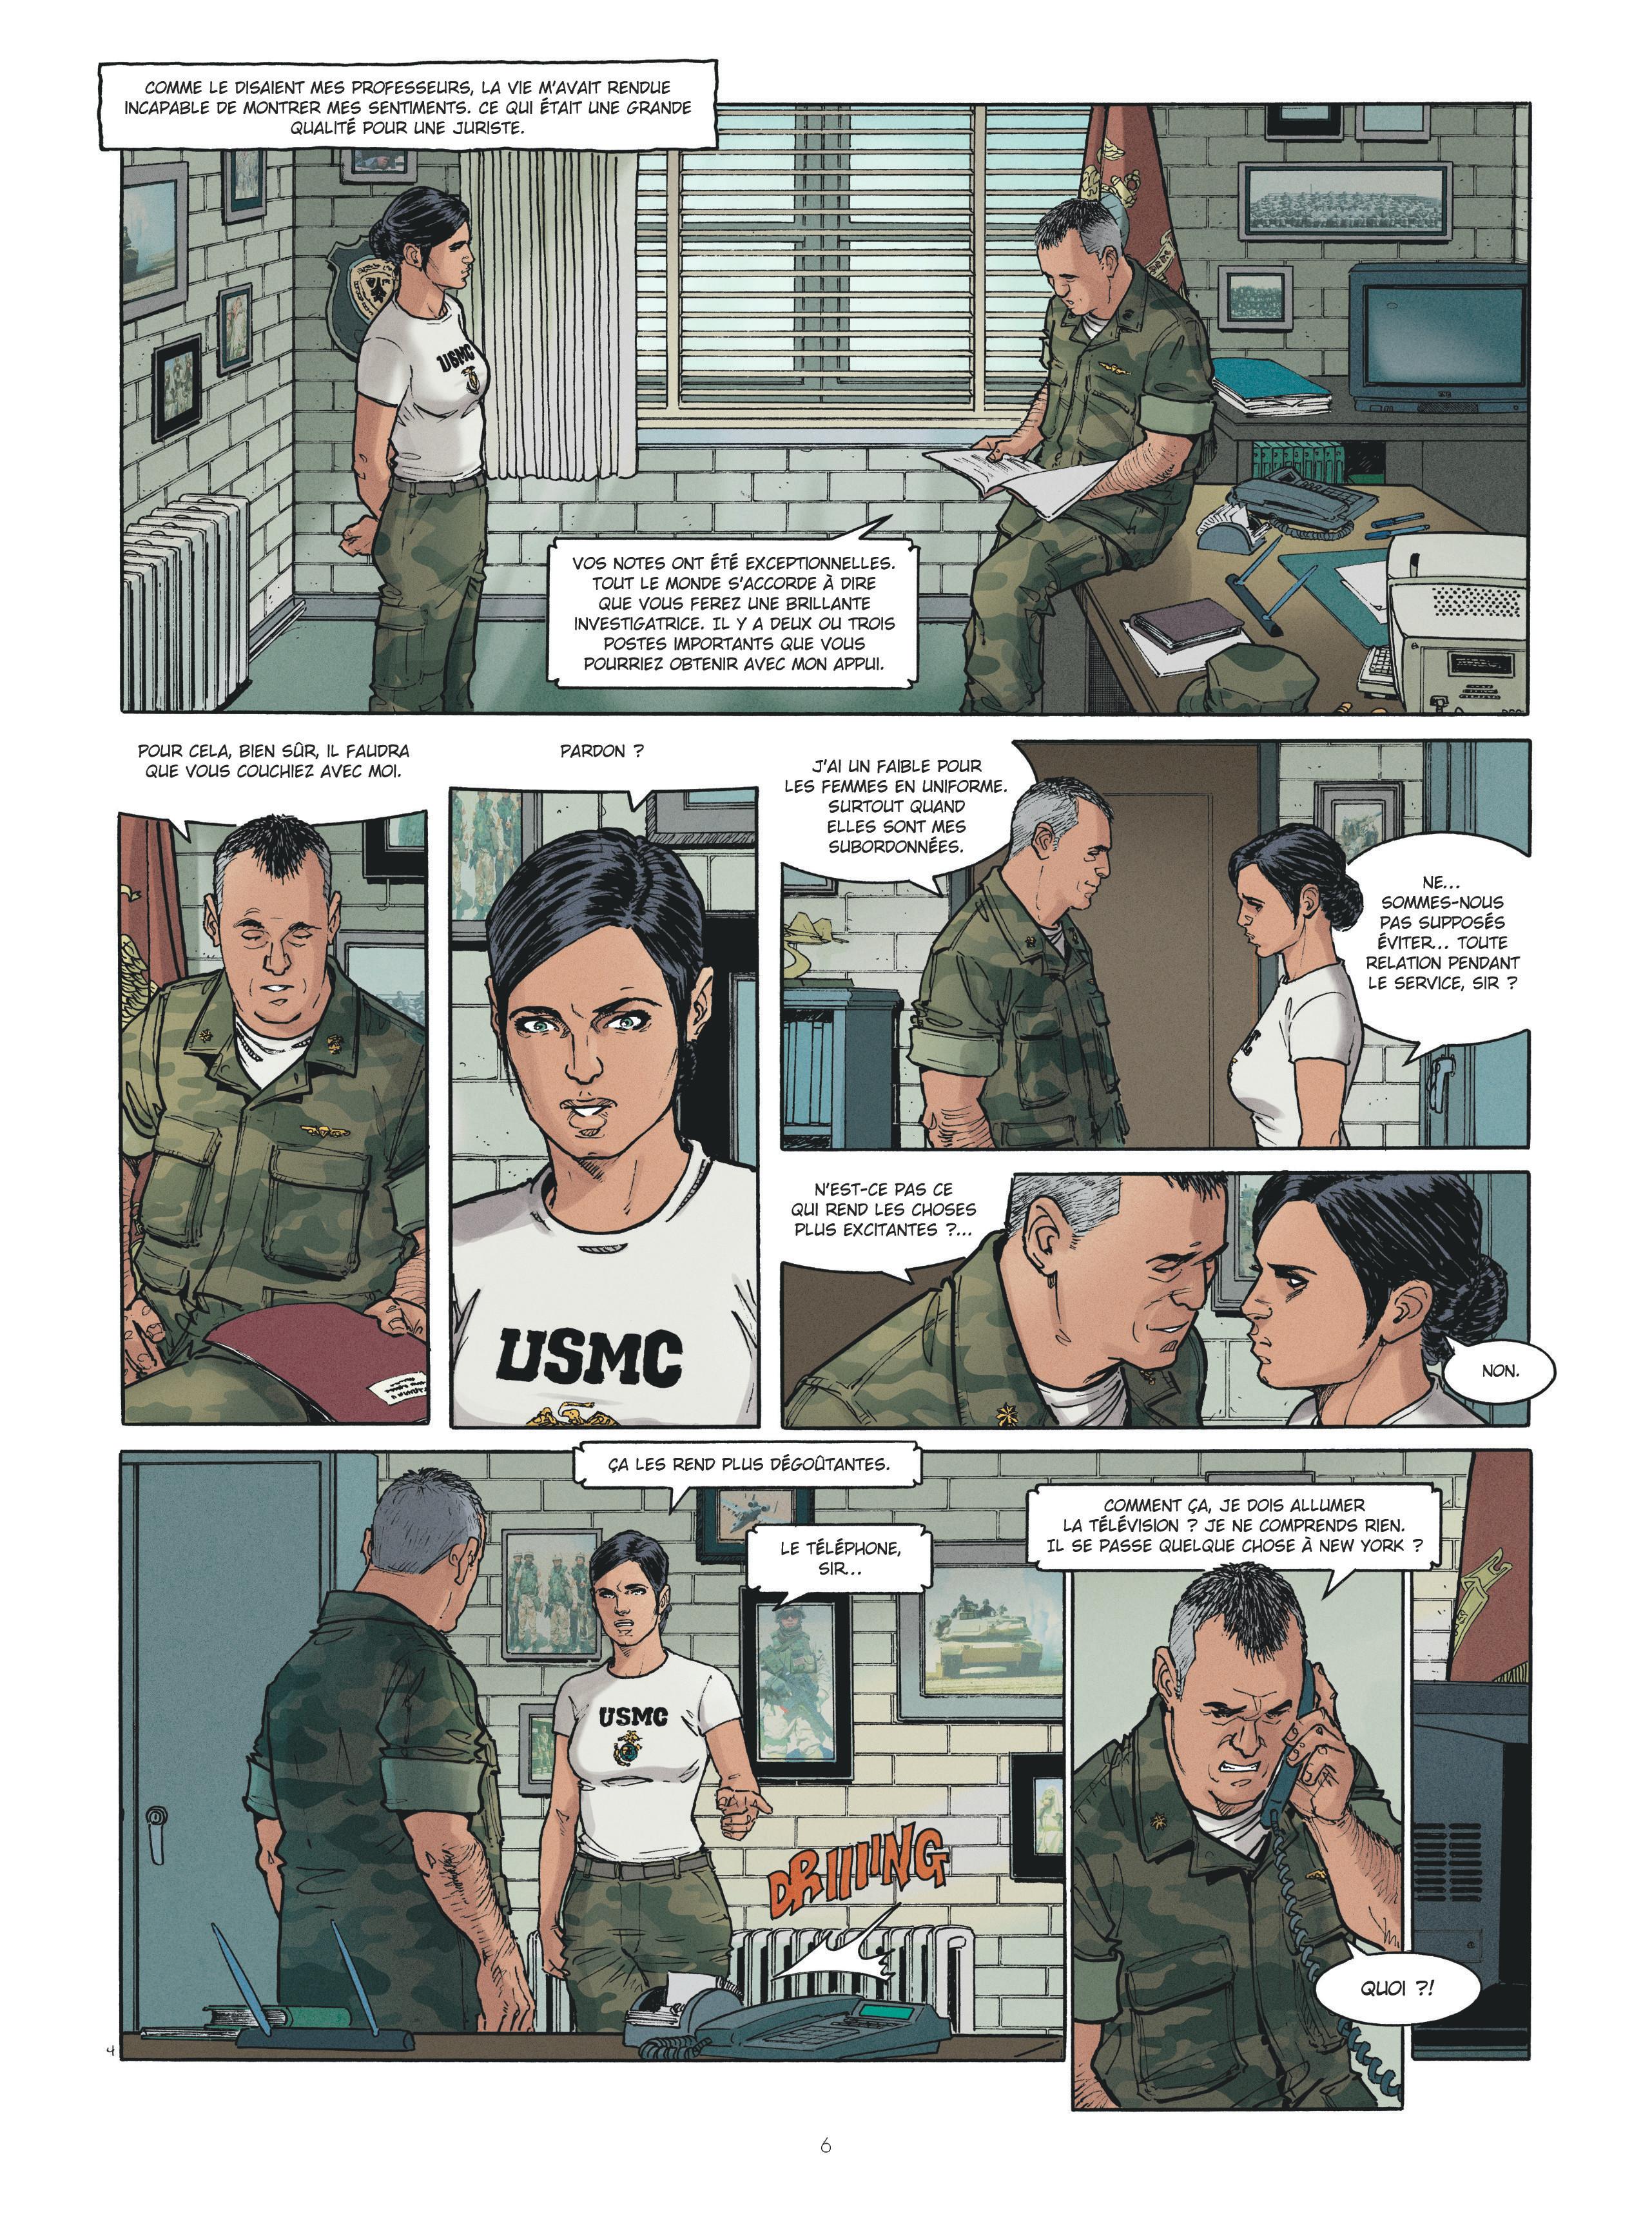 Bagdad_Inc_Page 6